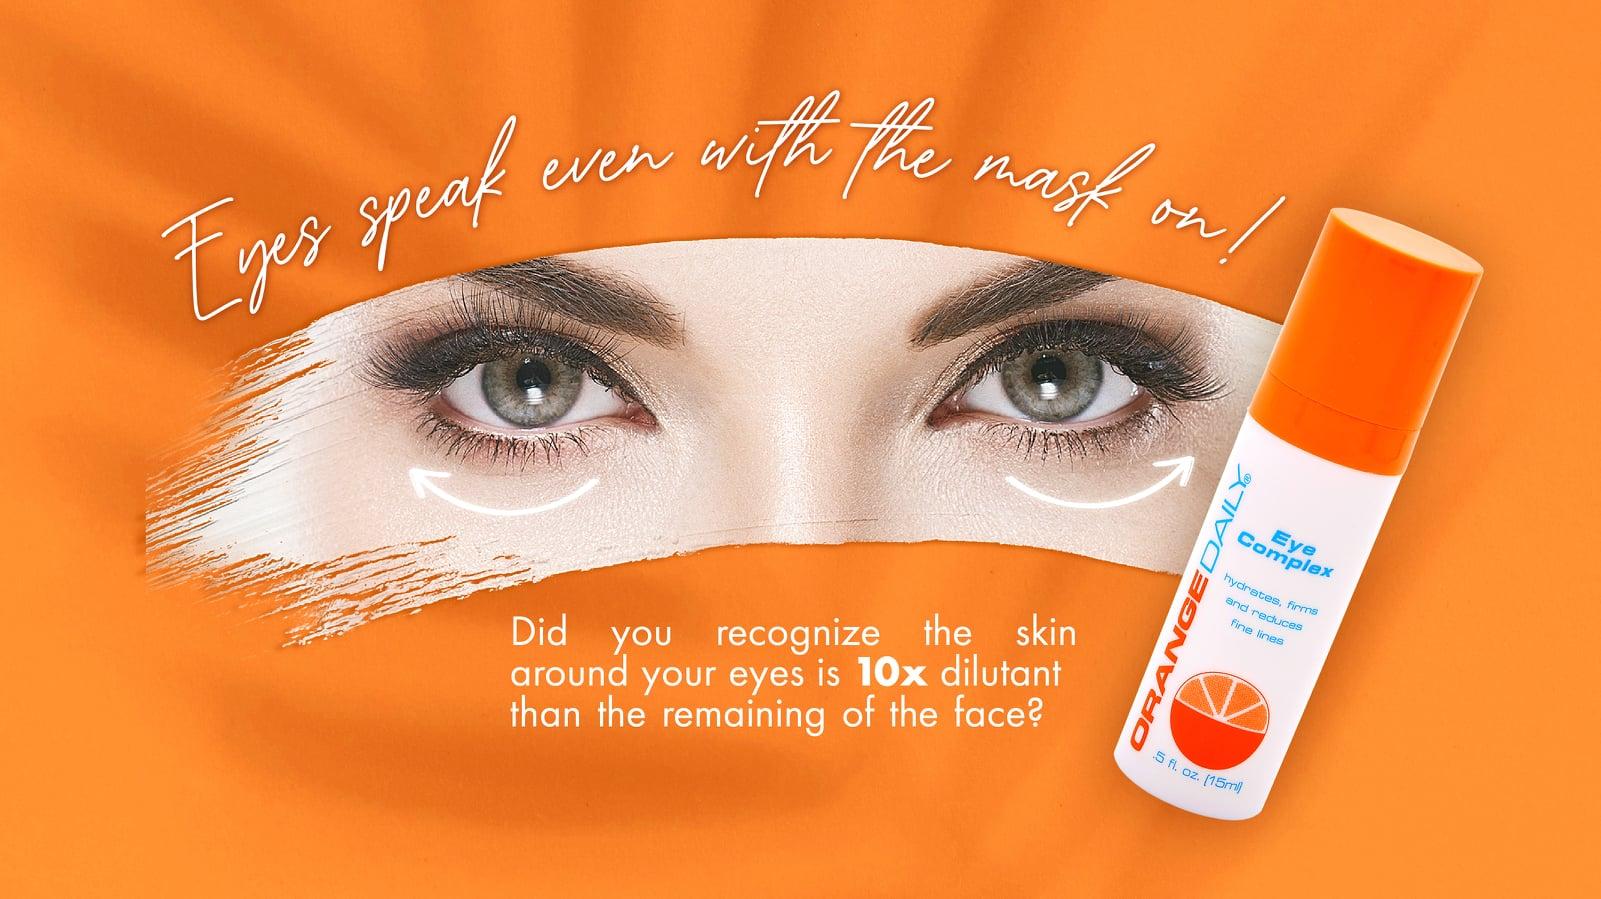 Eye Complex Under Eye Cream | Reduce Fine Lines & Wrinkles | Orange Daily